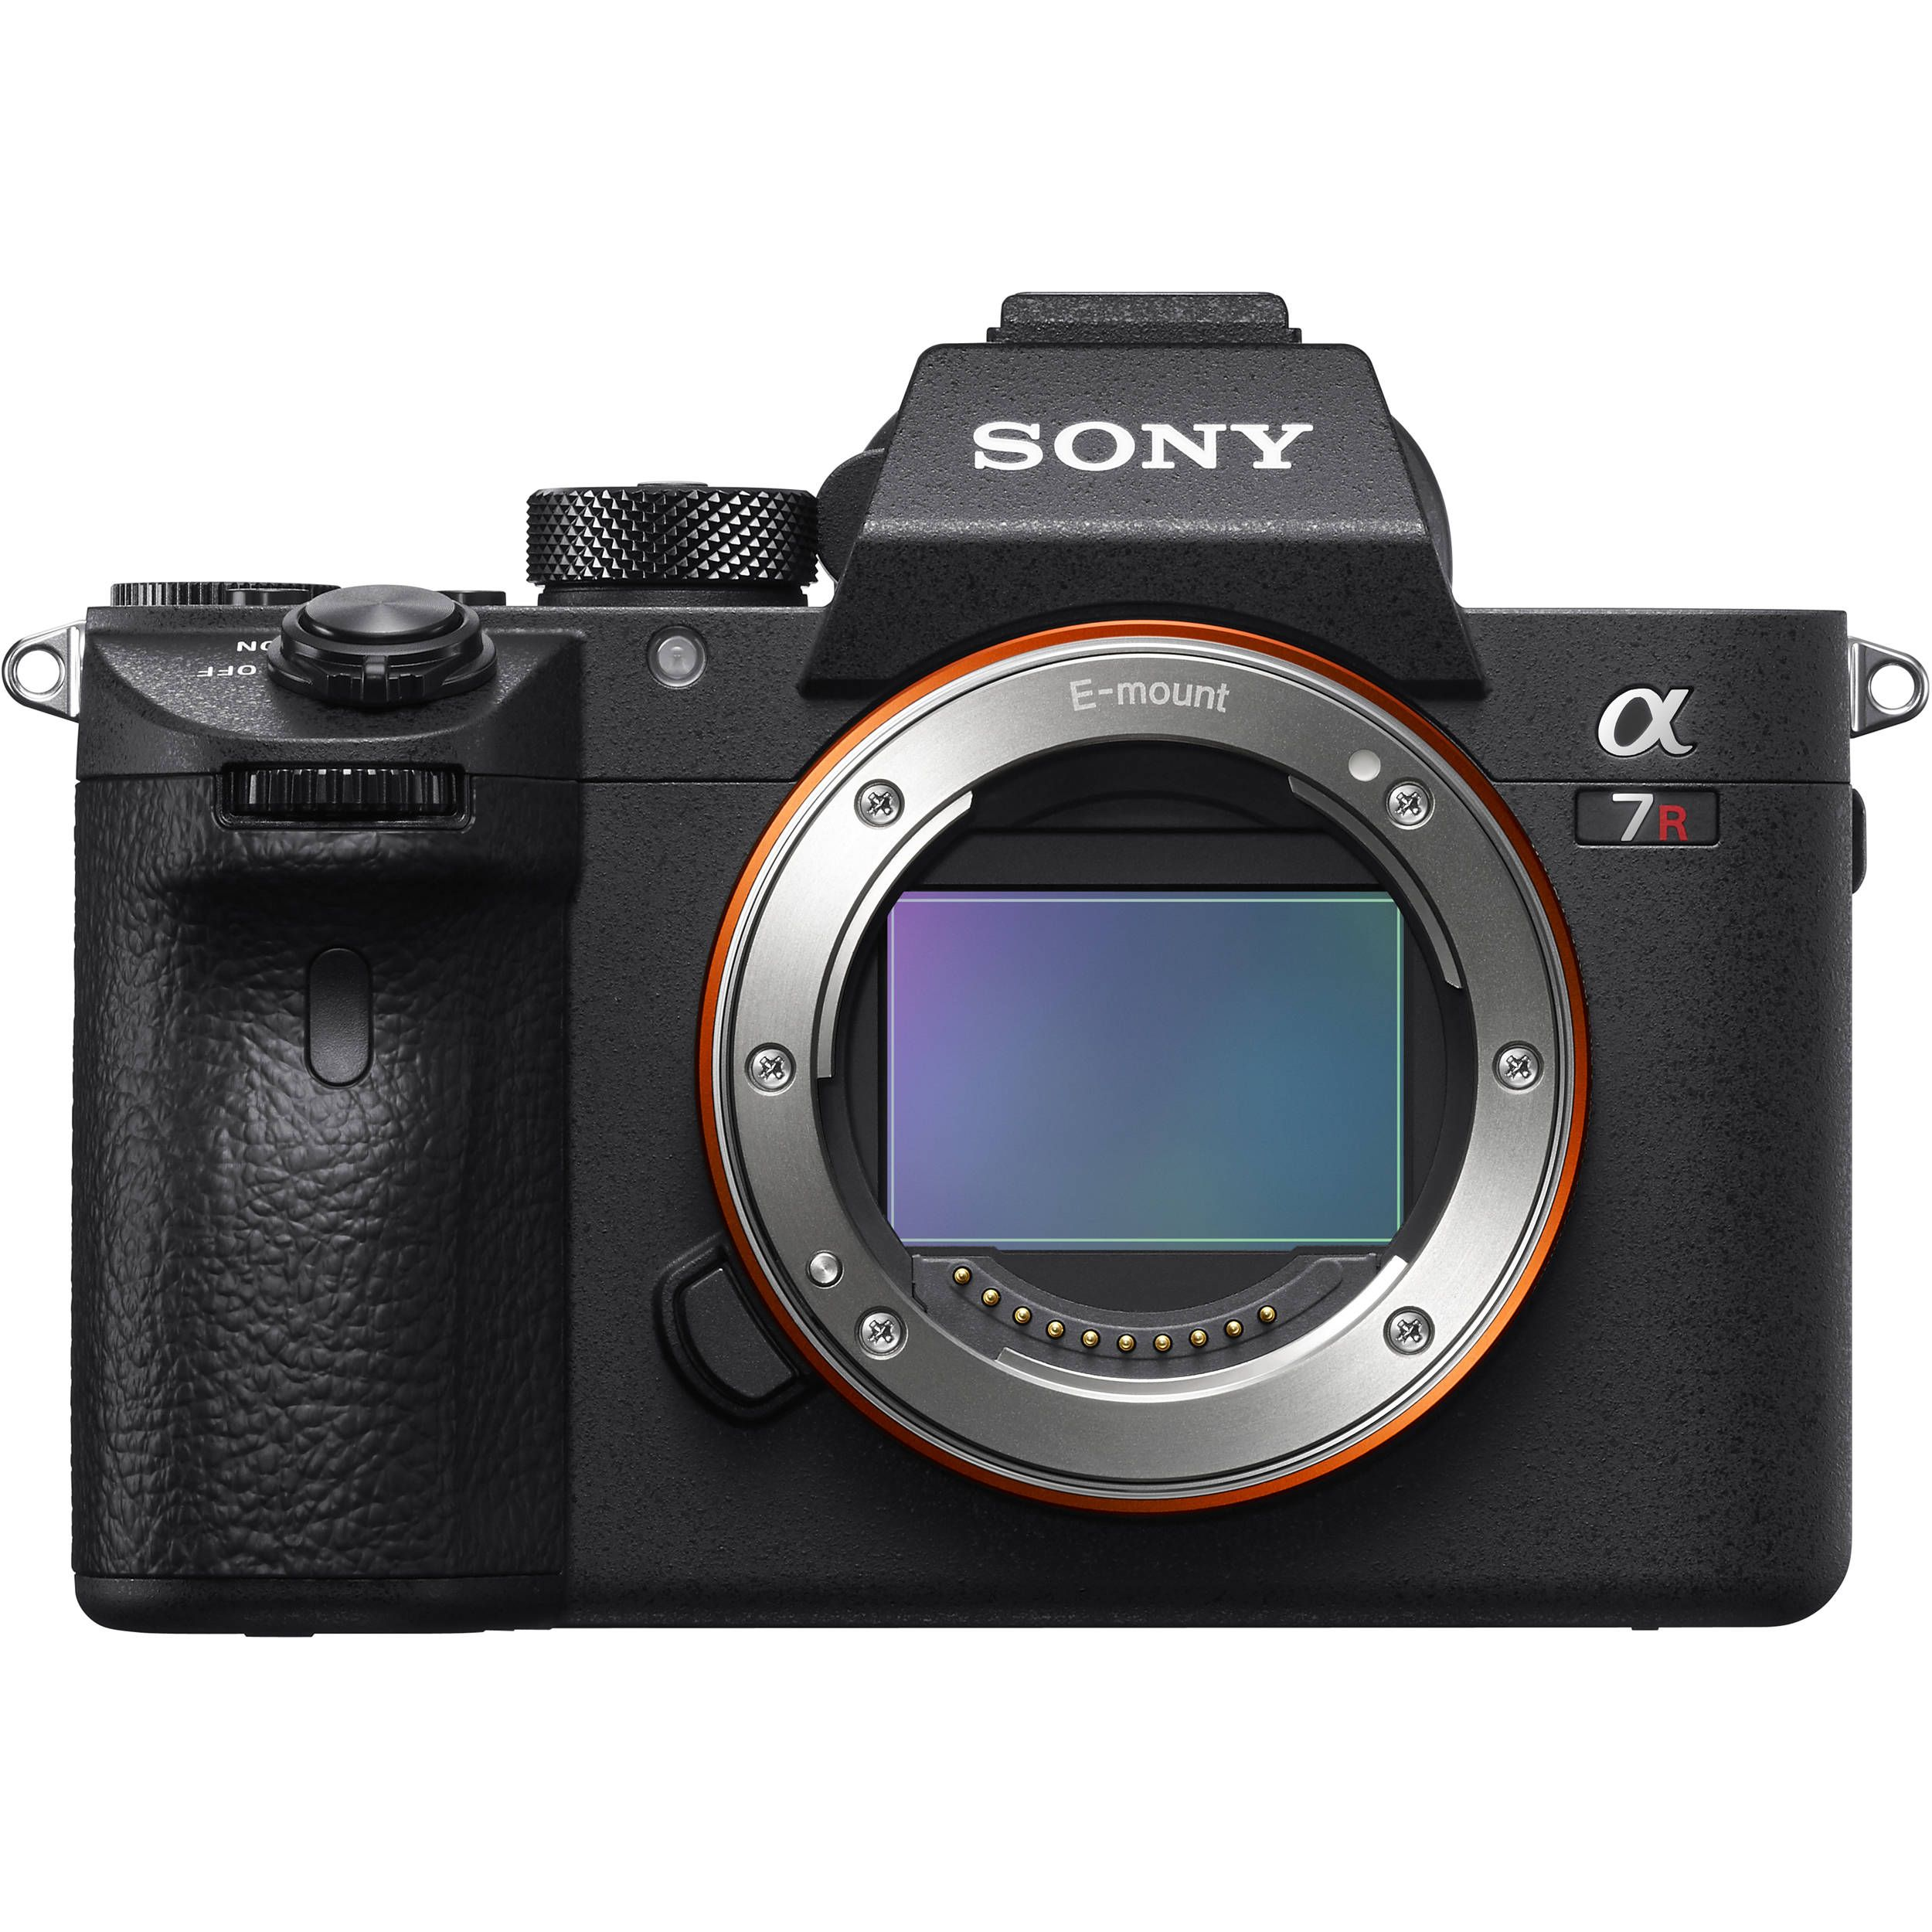 Sony Alpha A7r Iii Mirrorless Digital Camera Body Only Dijital Fotograf Makinesi Sony Teknoloji